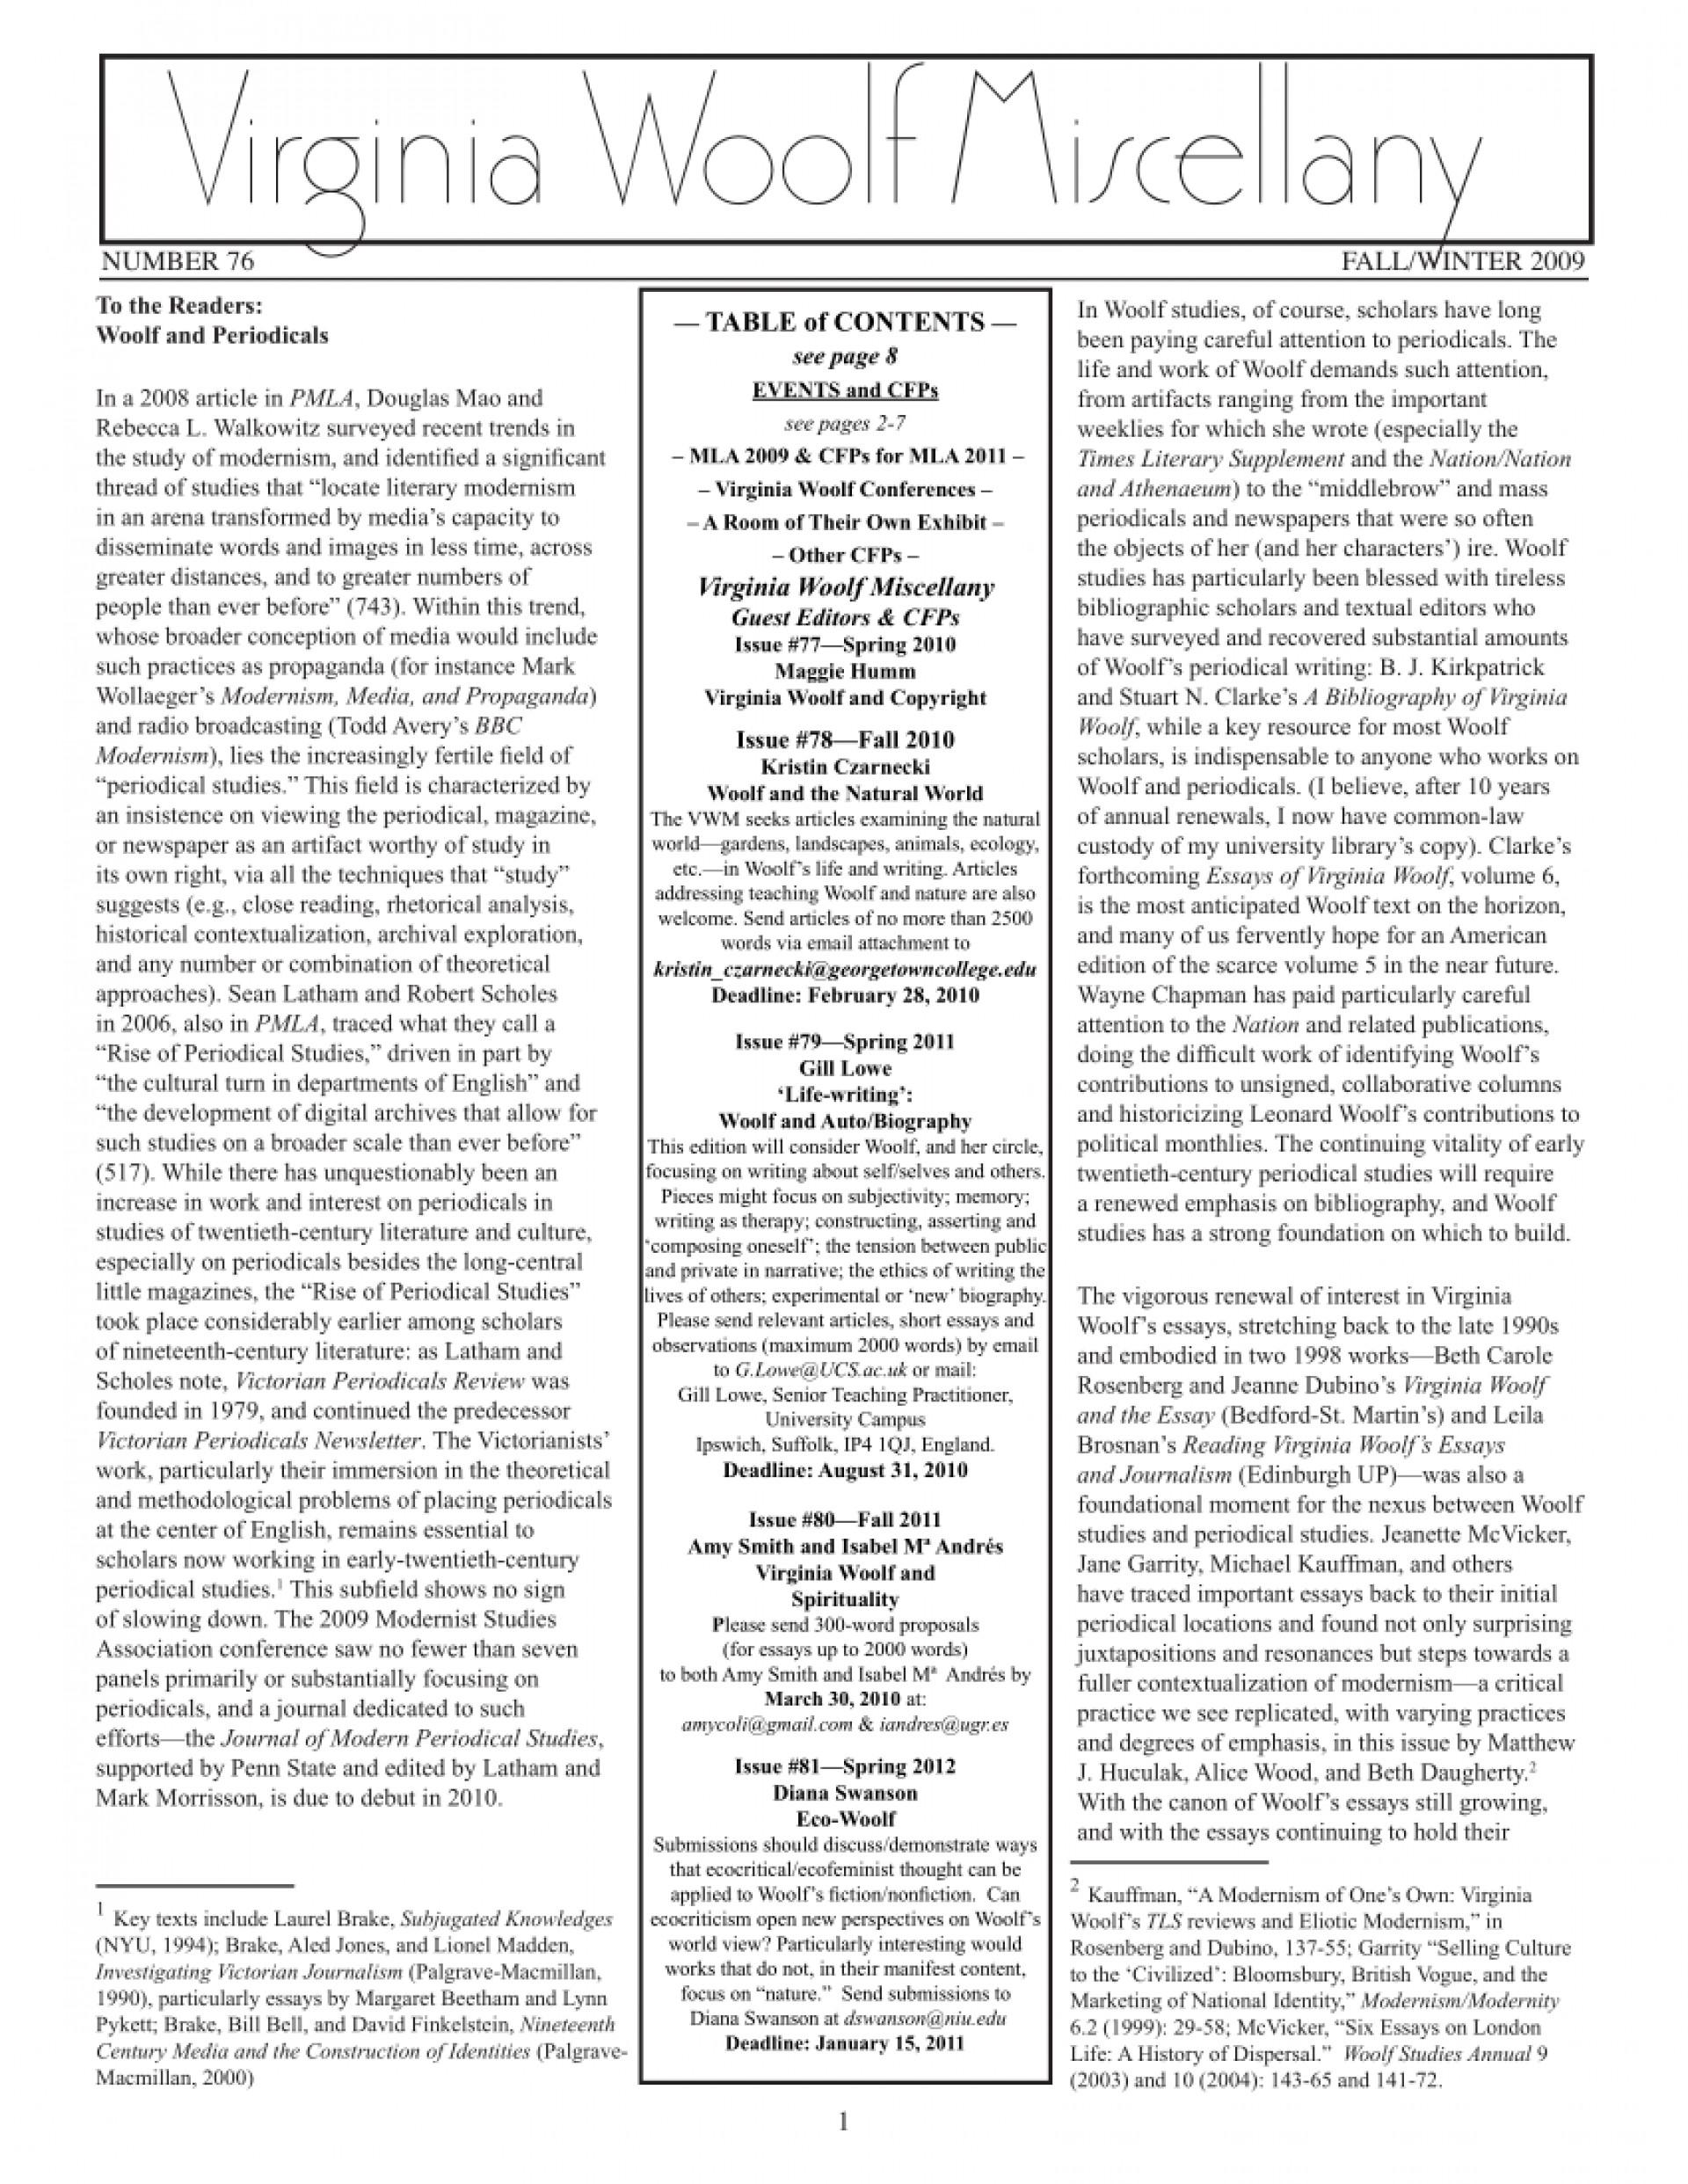 010 Virginia Woolf Essays Essay Example Unusual Online The Modern Analysis On Self 1920